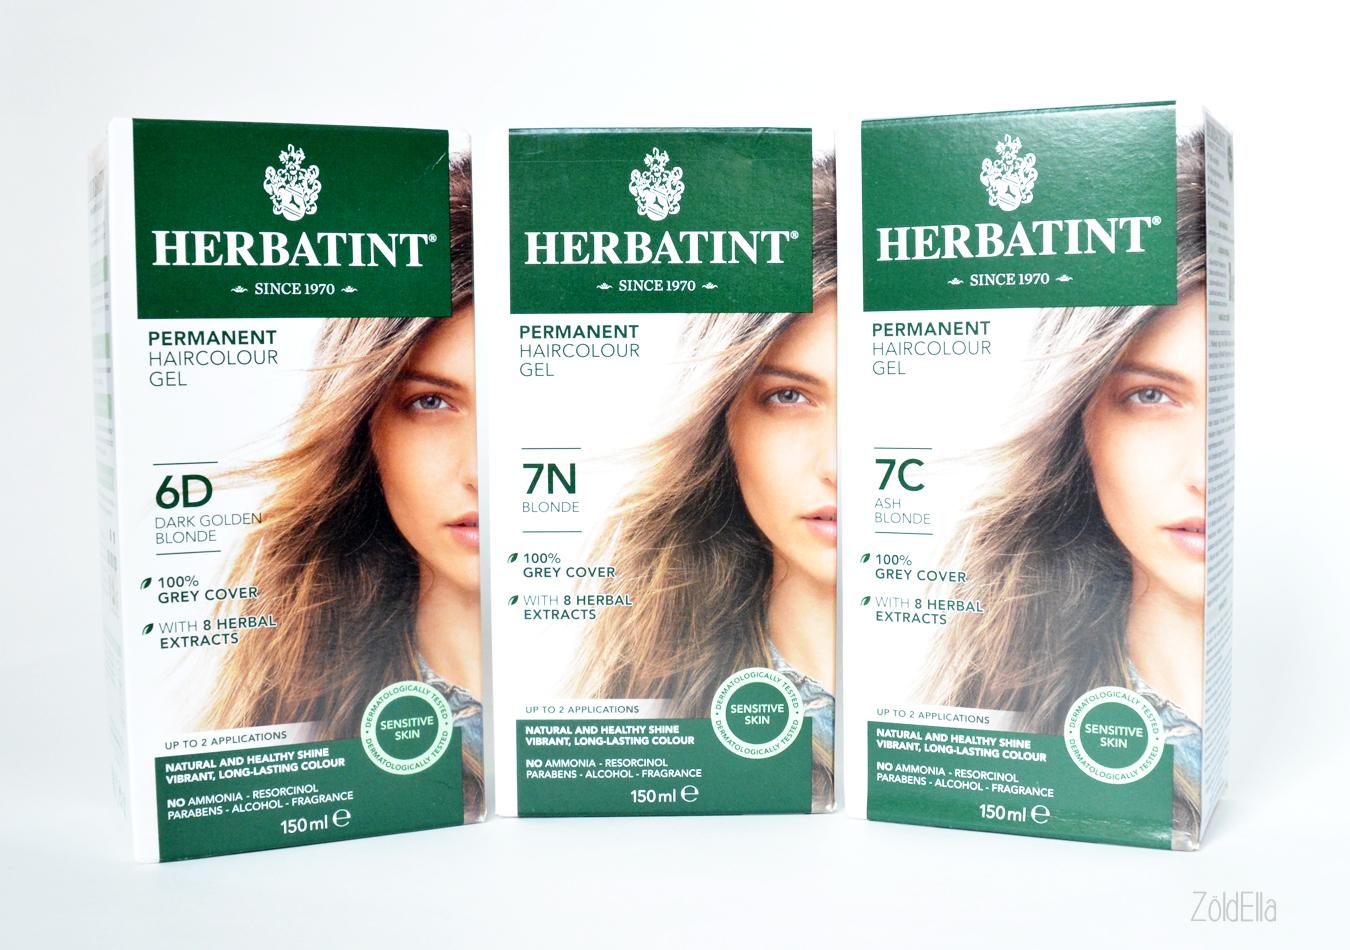 herbatint_hajfestek_zoldella_vegan_blog_5.jpg